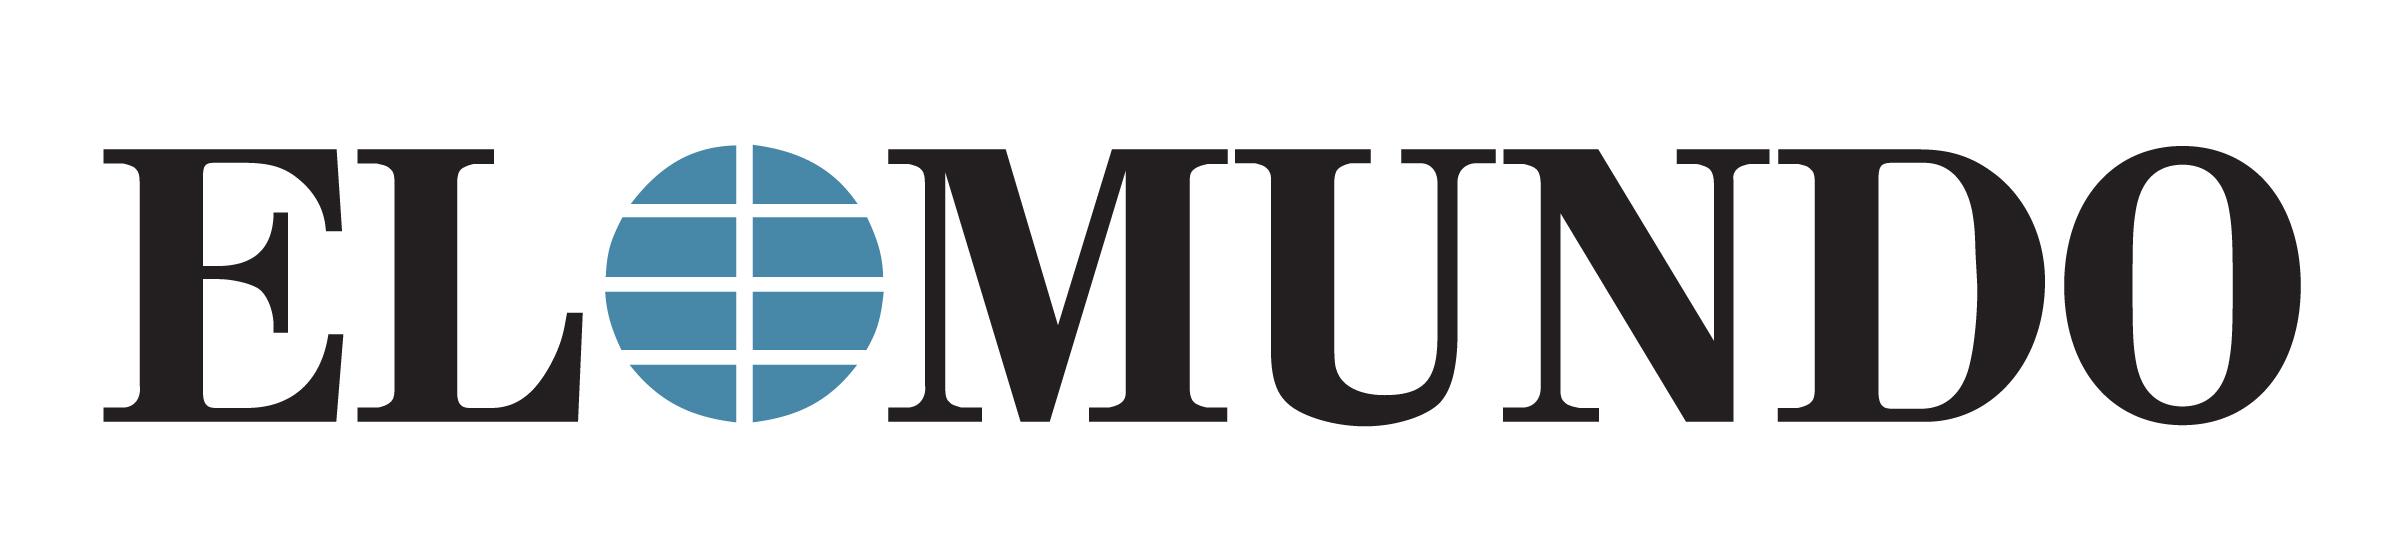 logo del periodico elmundo